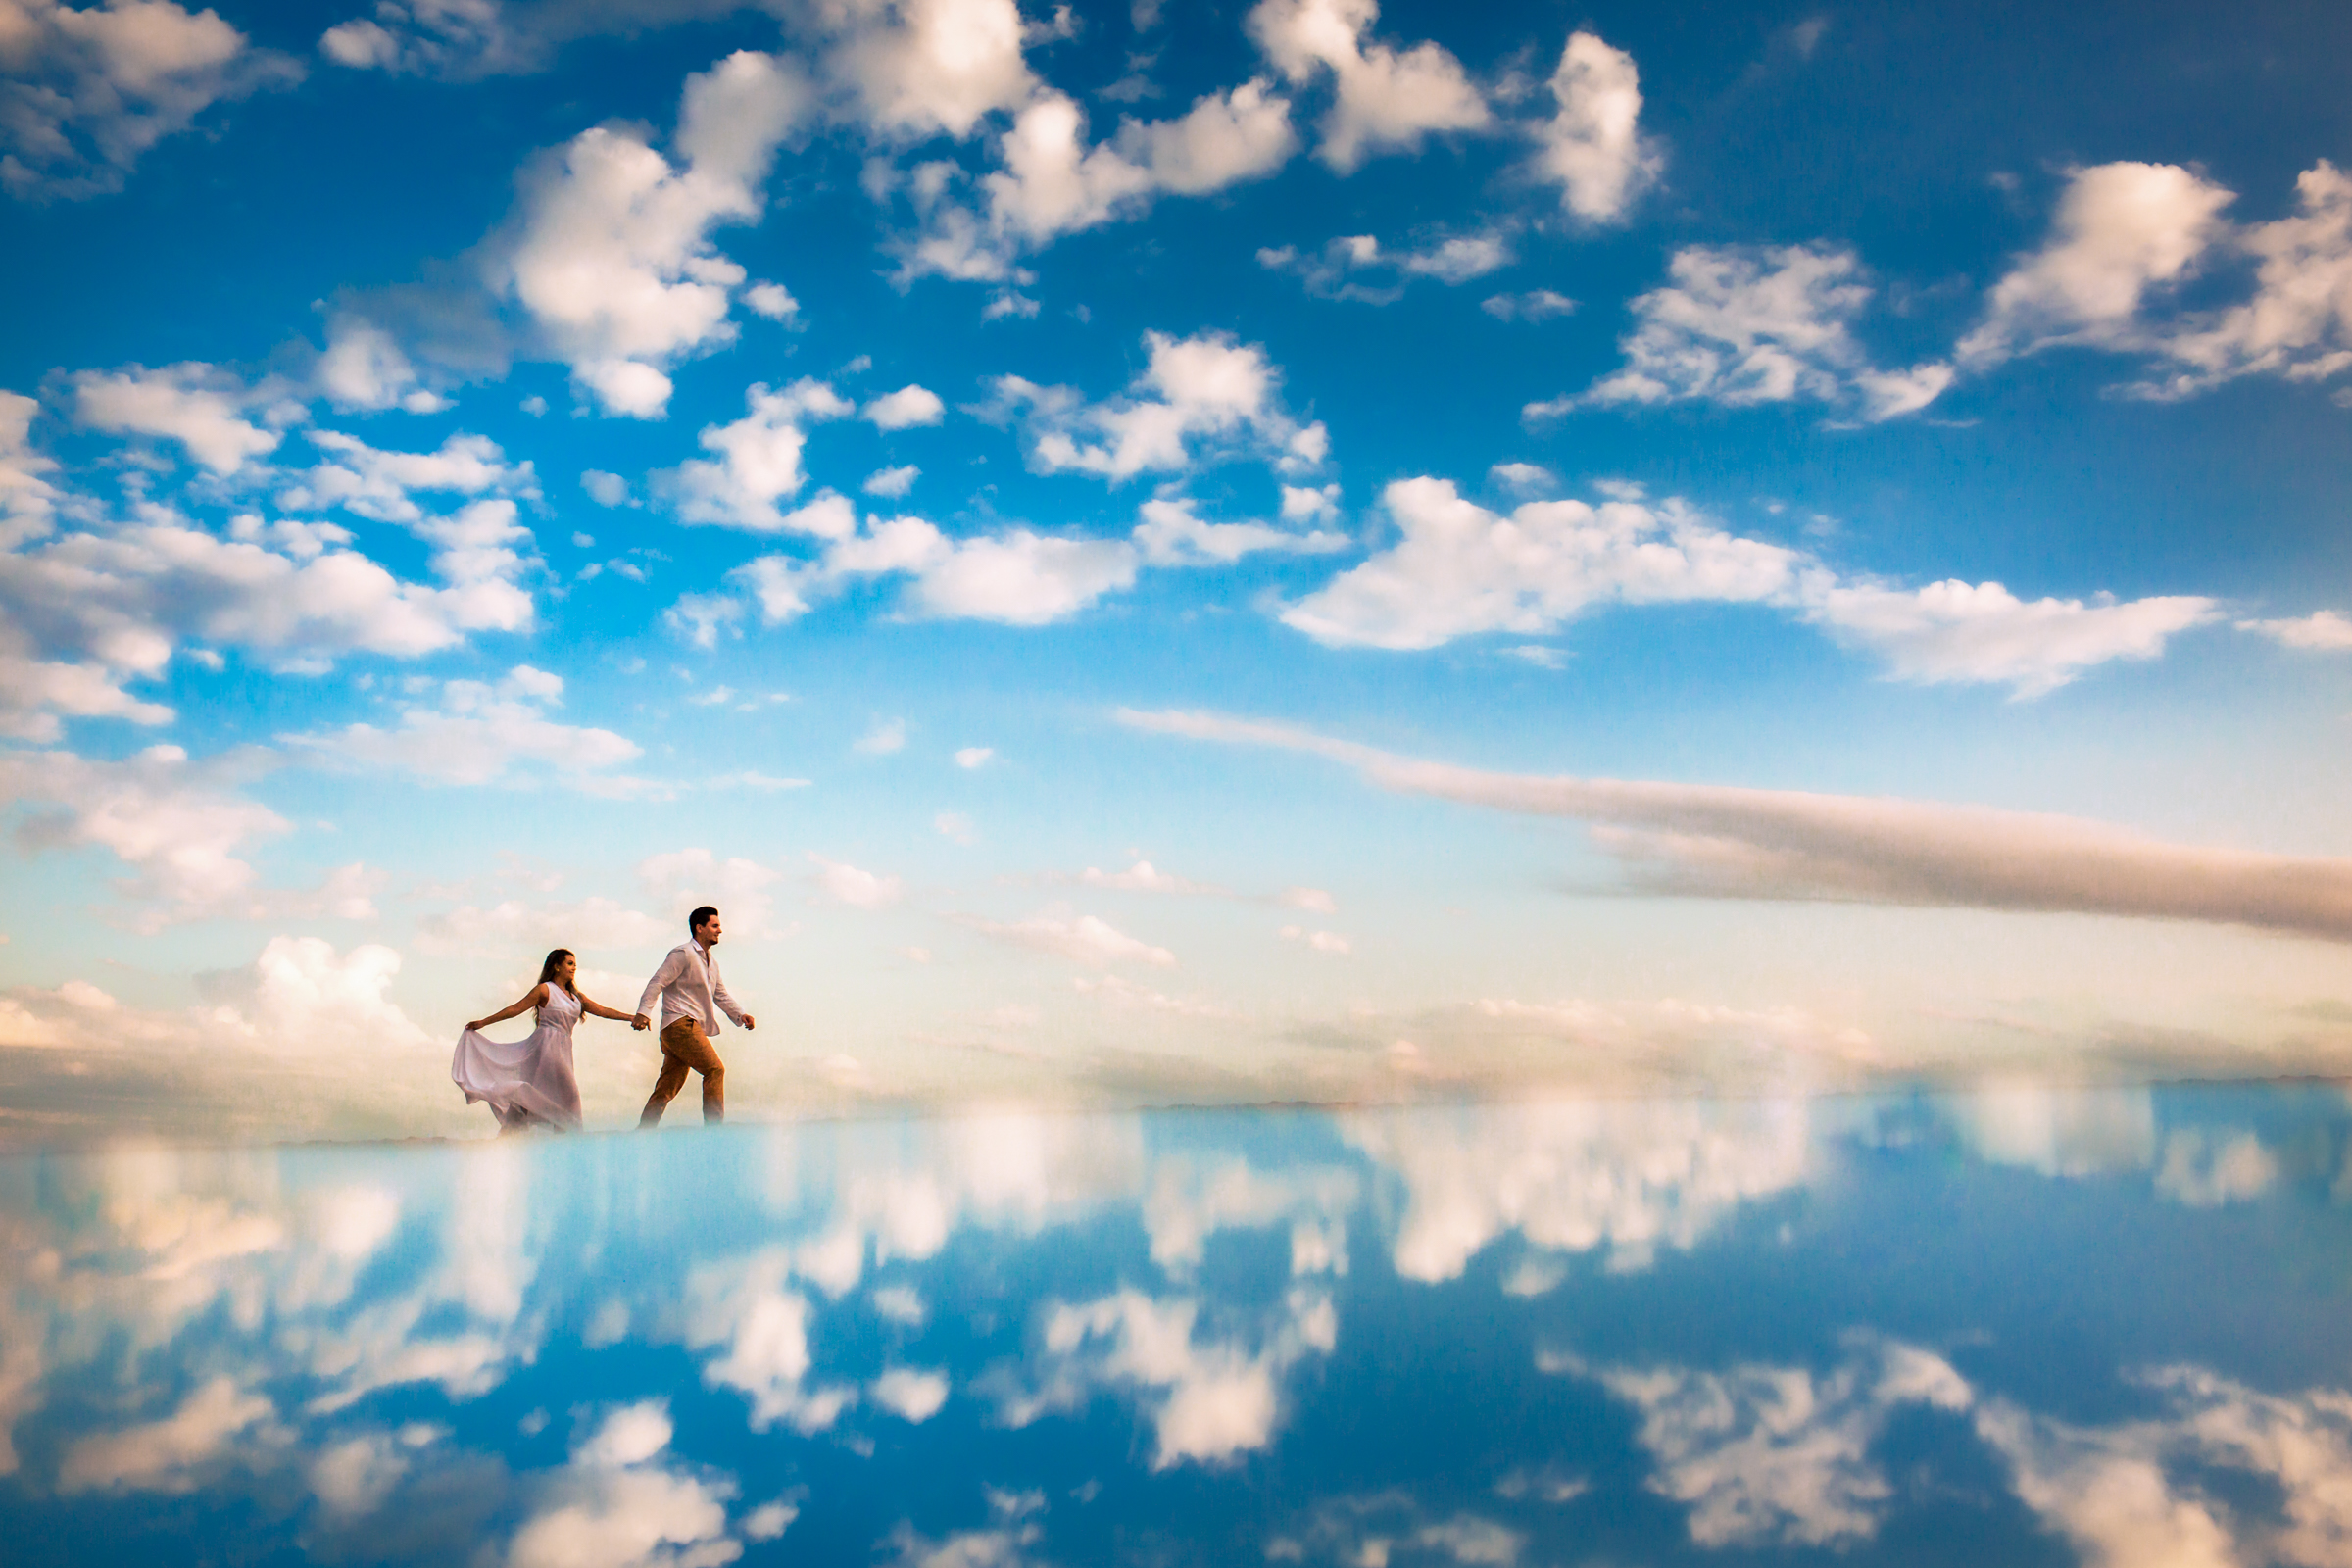 couple-walking-on-clouds-in-blue-sky-area-da-fotografia